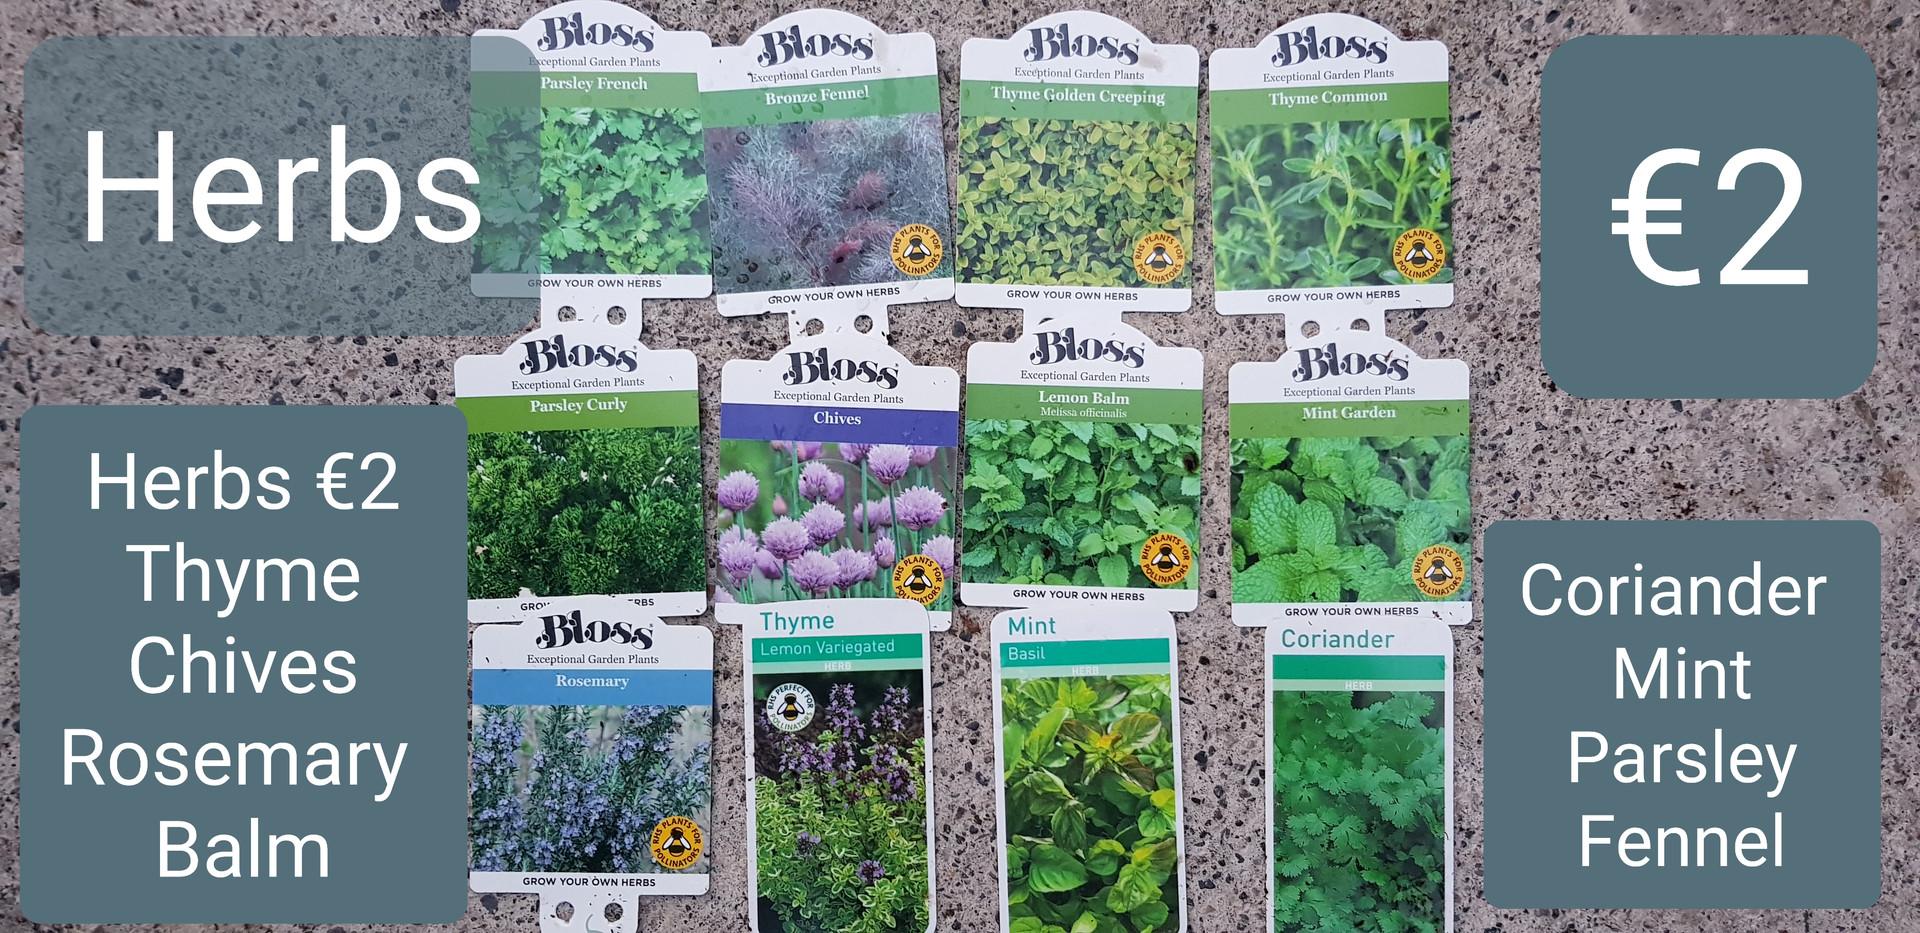 Herbs selection €2